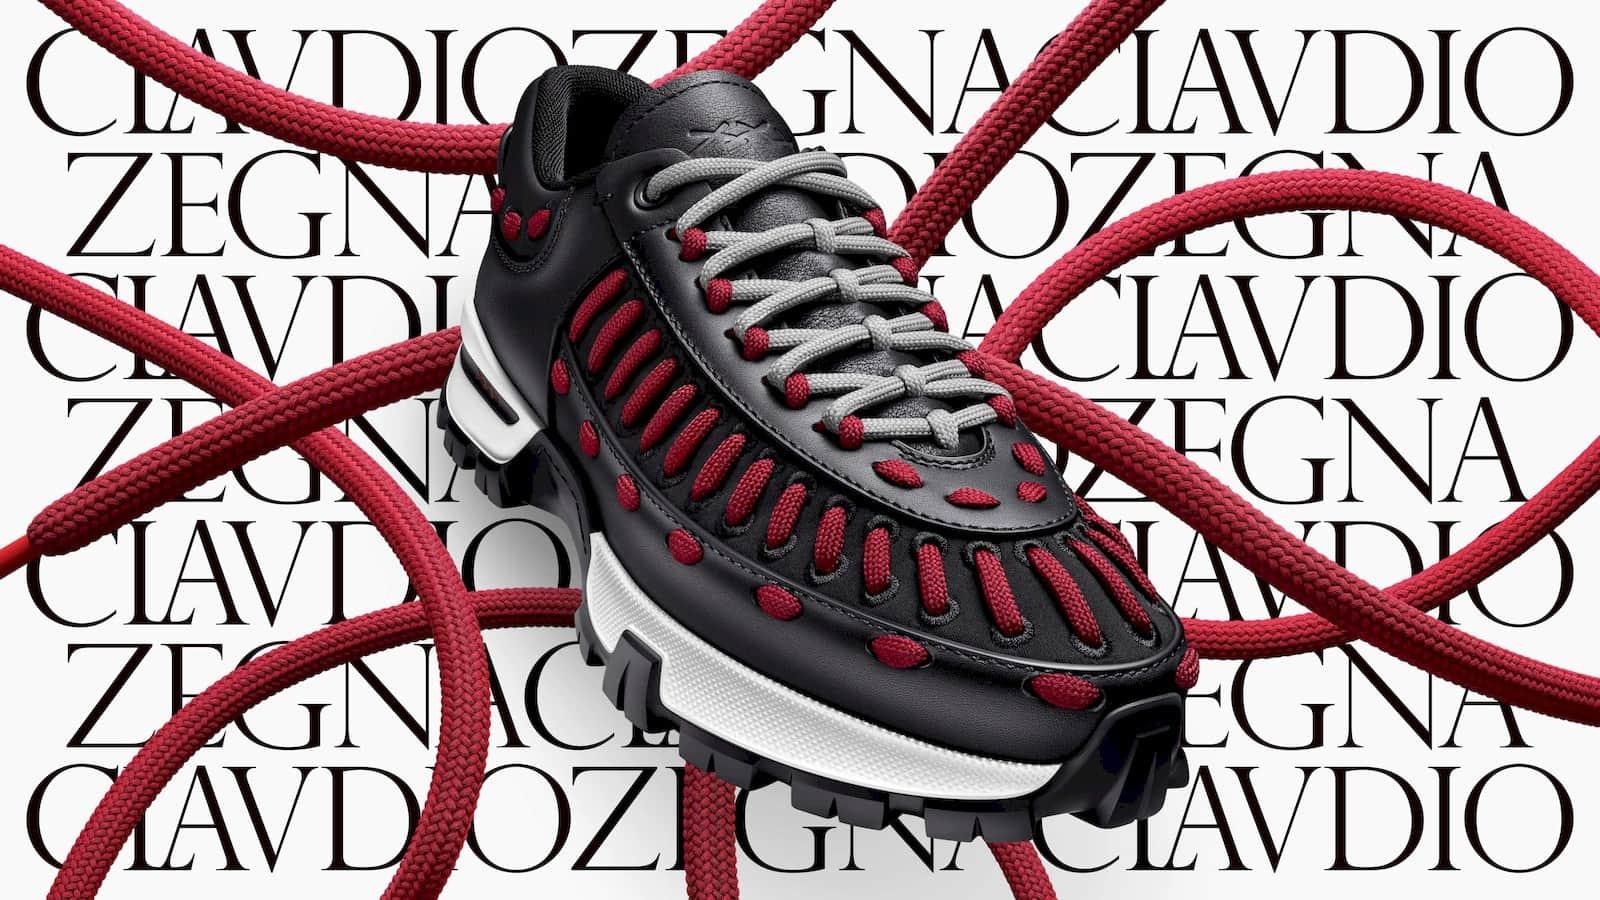 Ermenegildo Zegna lets you personalise its 'My Claudio' sneakers